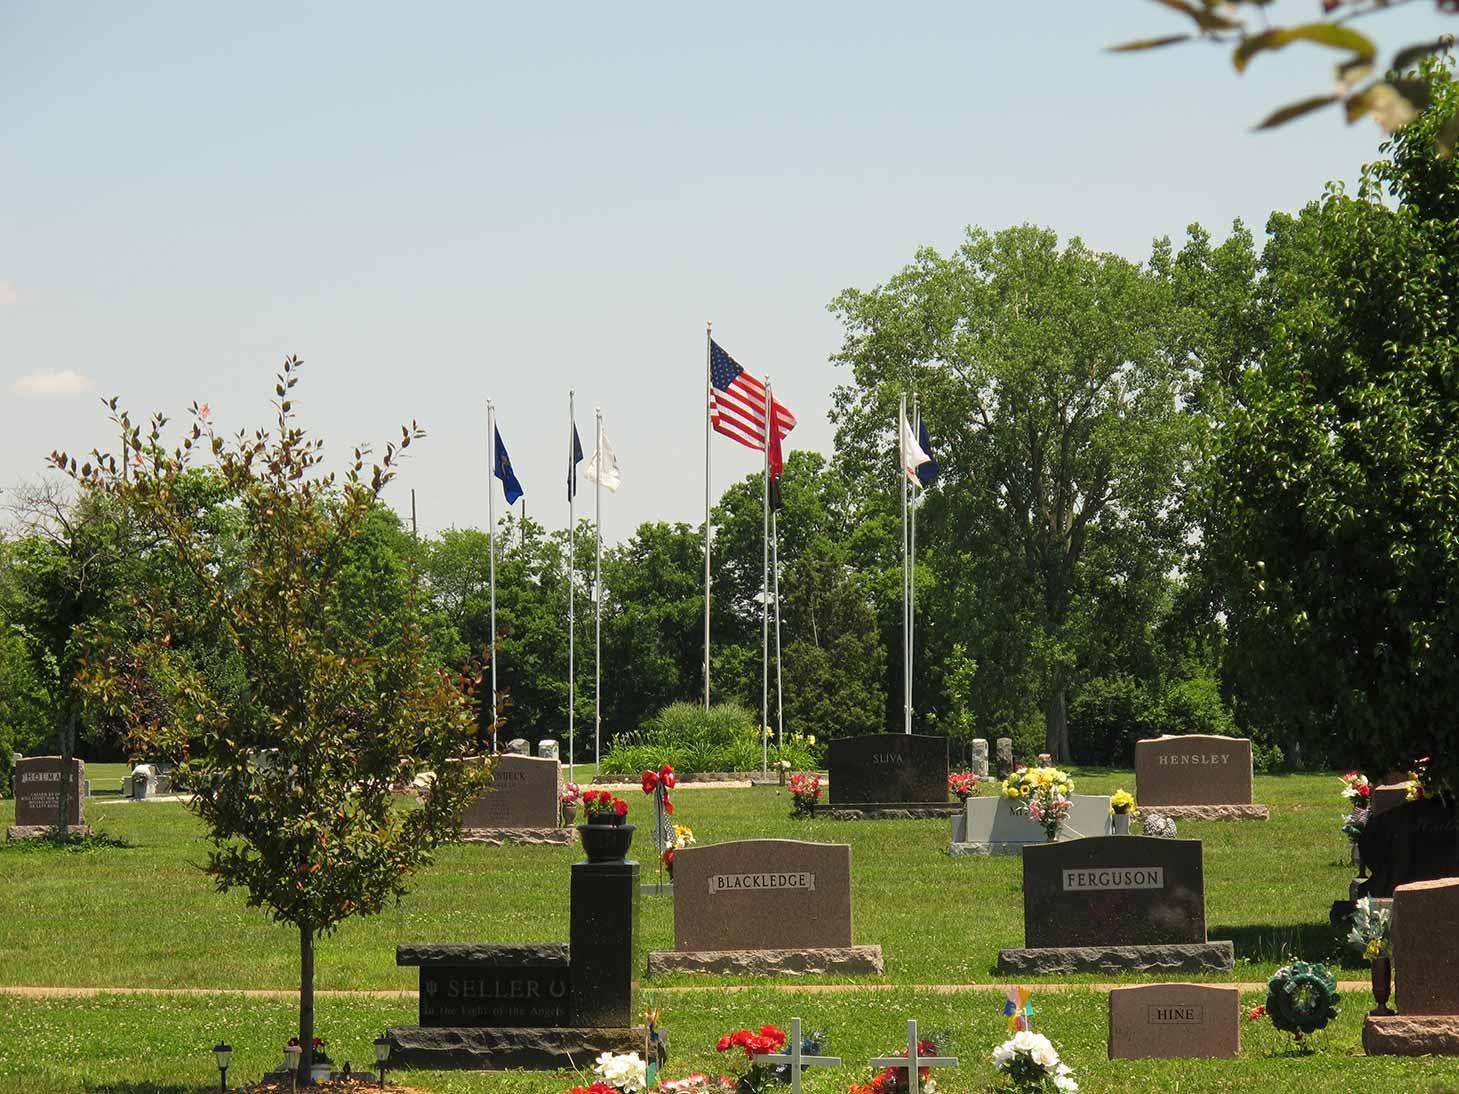 west-ridge-park-memorials_5901168434_o